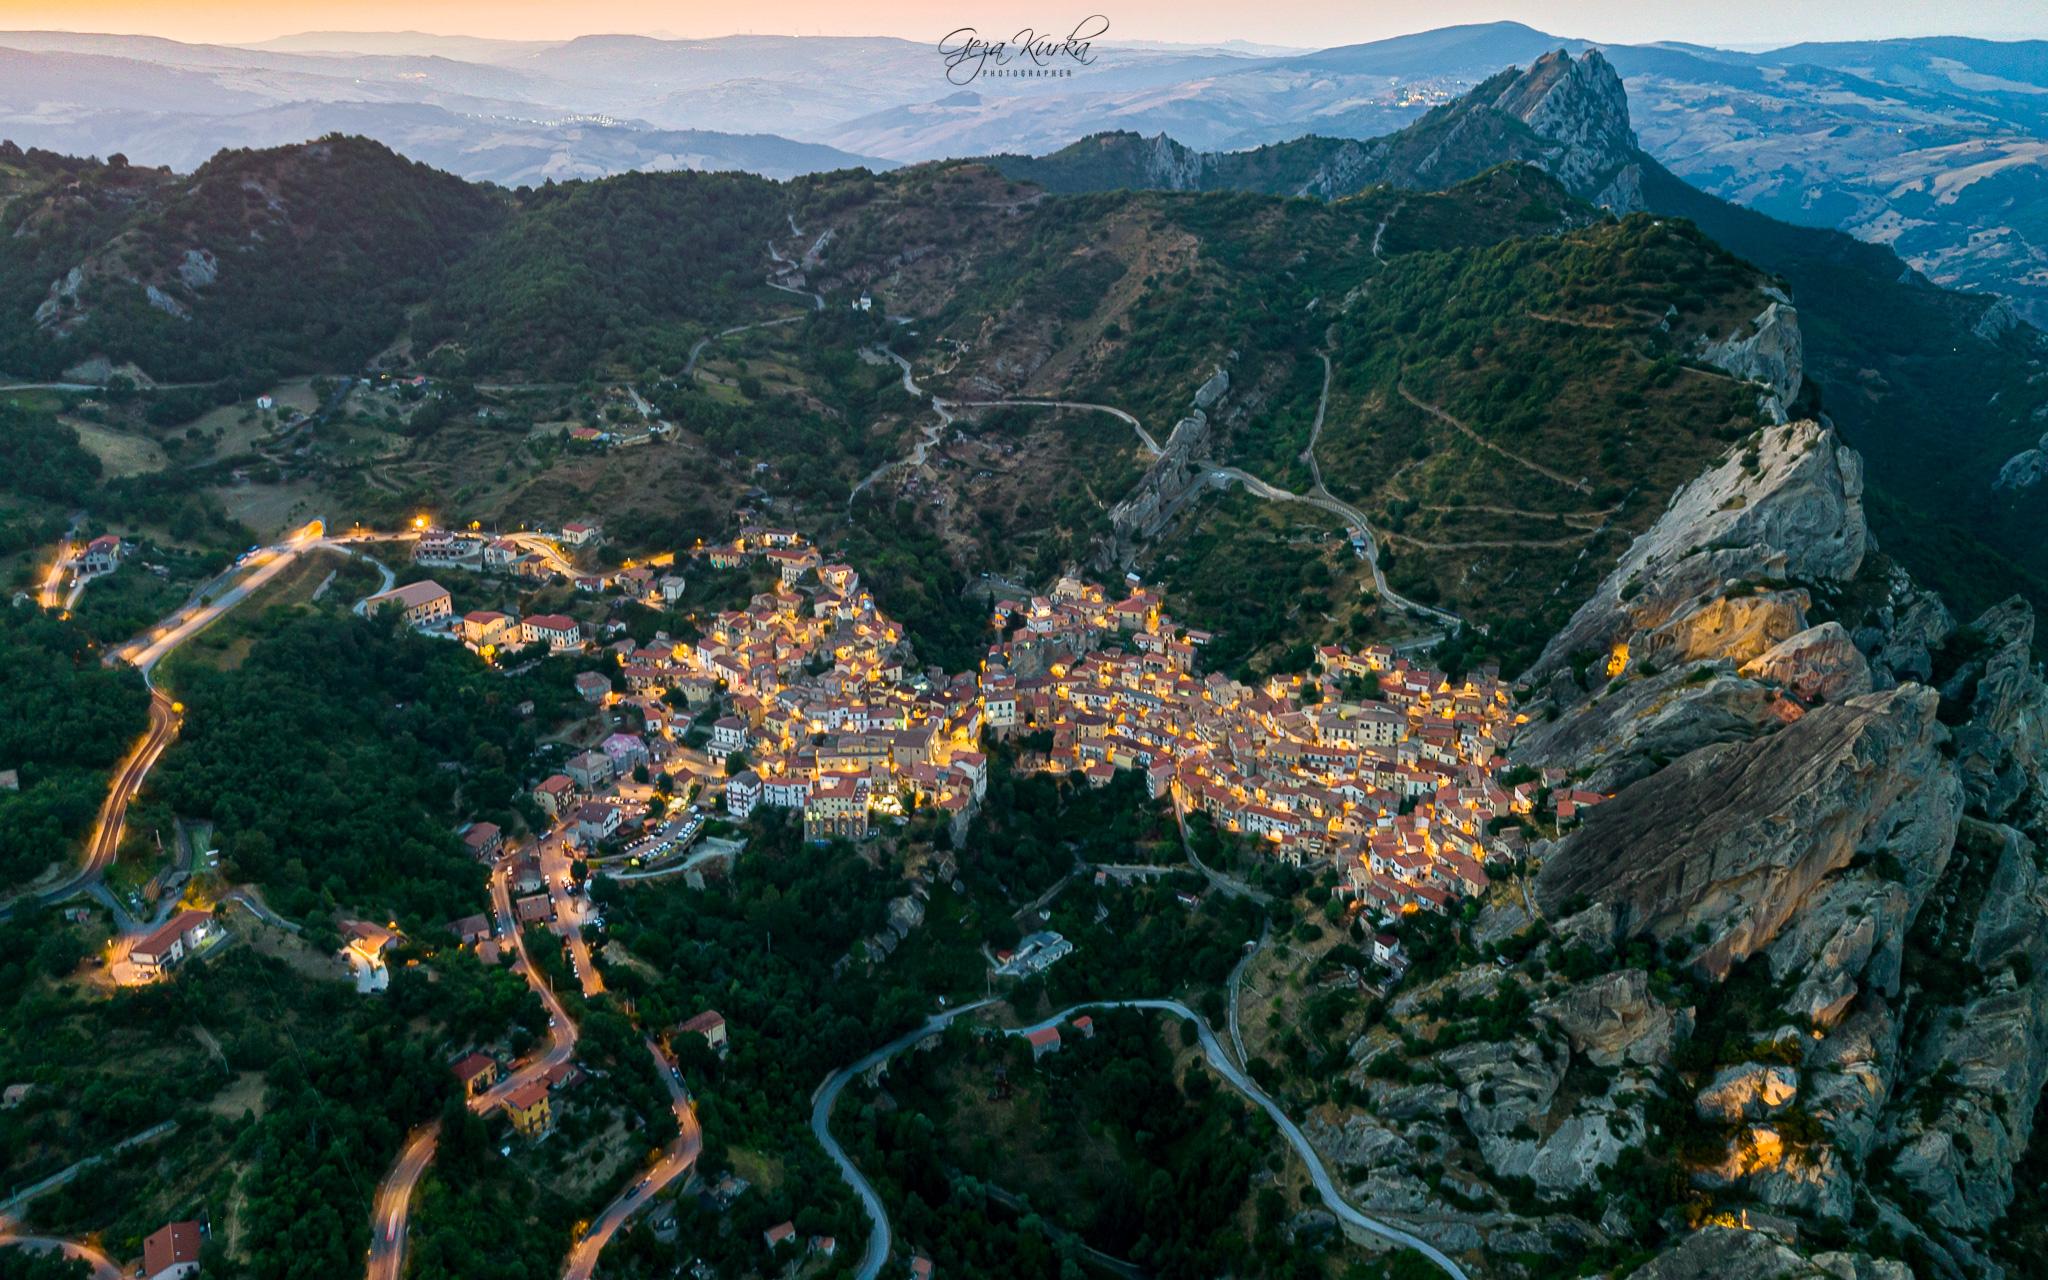 Castelmezzano with drone, Italy